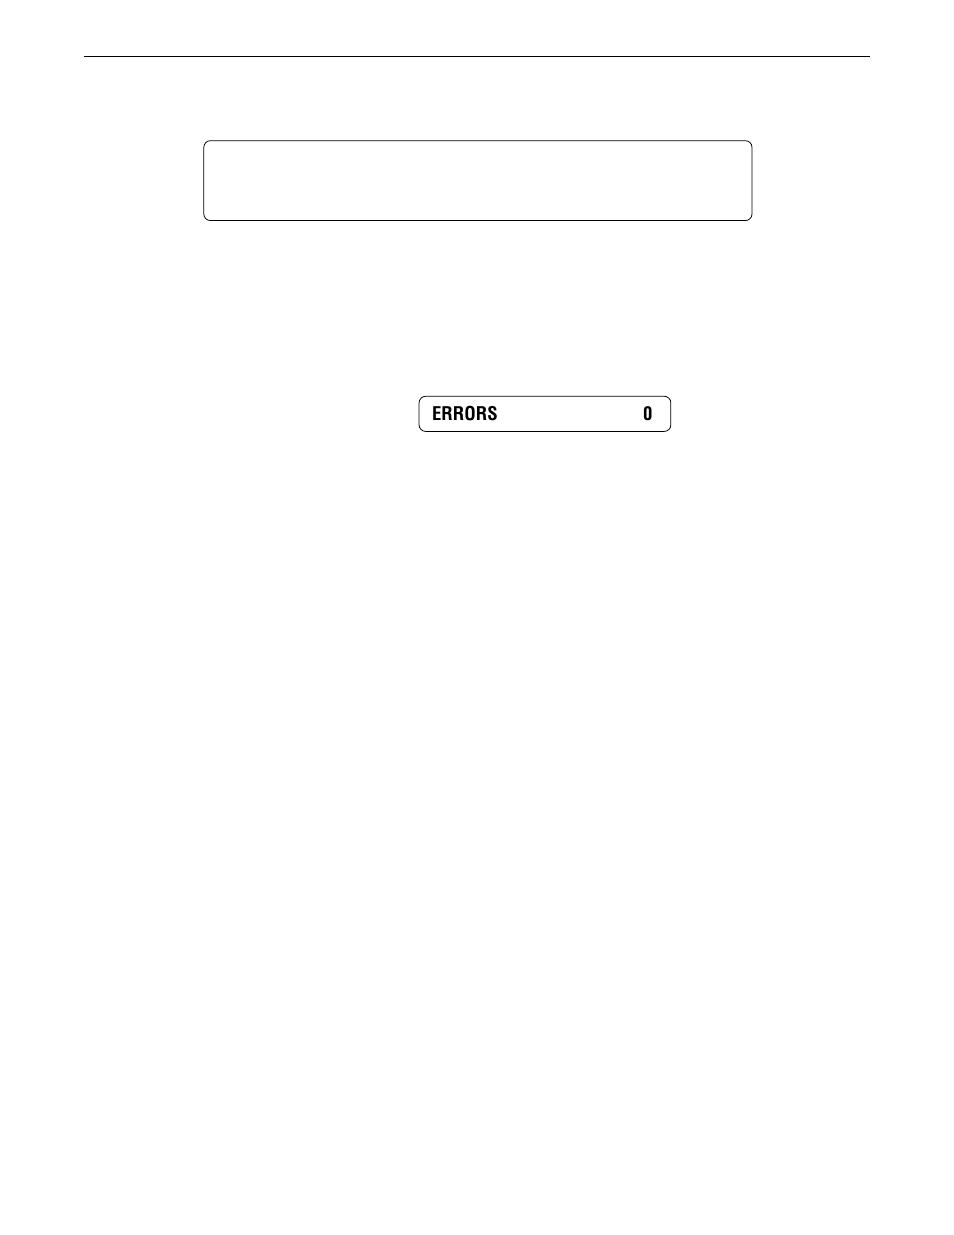 rocktron chameleon on line user manual page 94 103 original mode rh manualsdir com rocktron chameleon manual pdf rocktron chameleon 2000 manual pdf